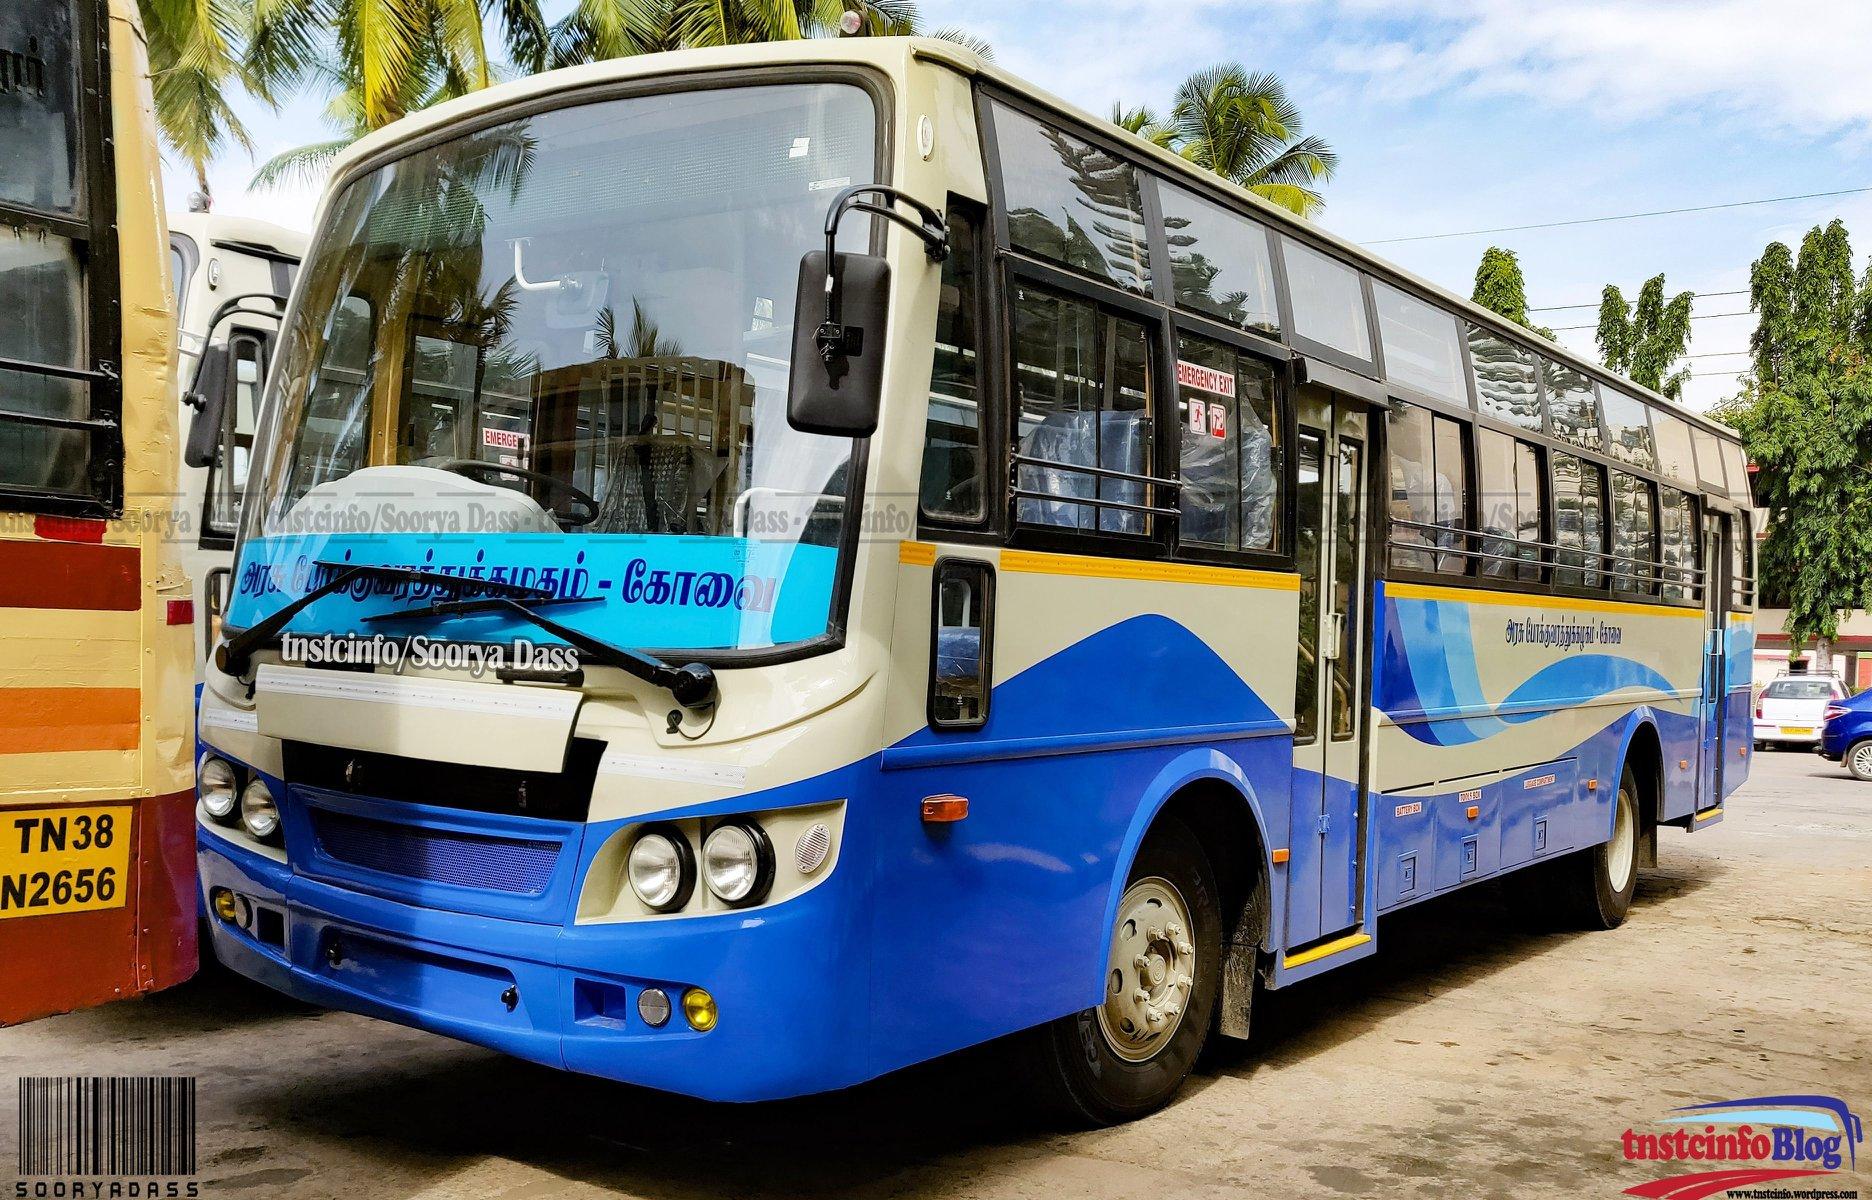 TNSTC to deploy 430 new buses - Aanavandi Travel Blog